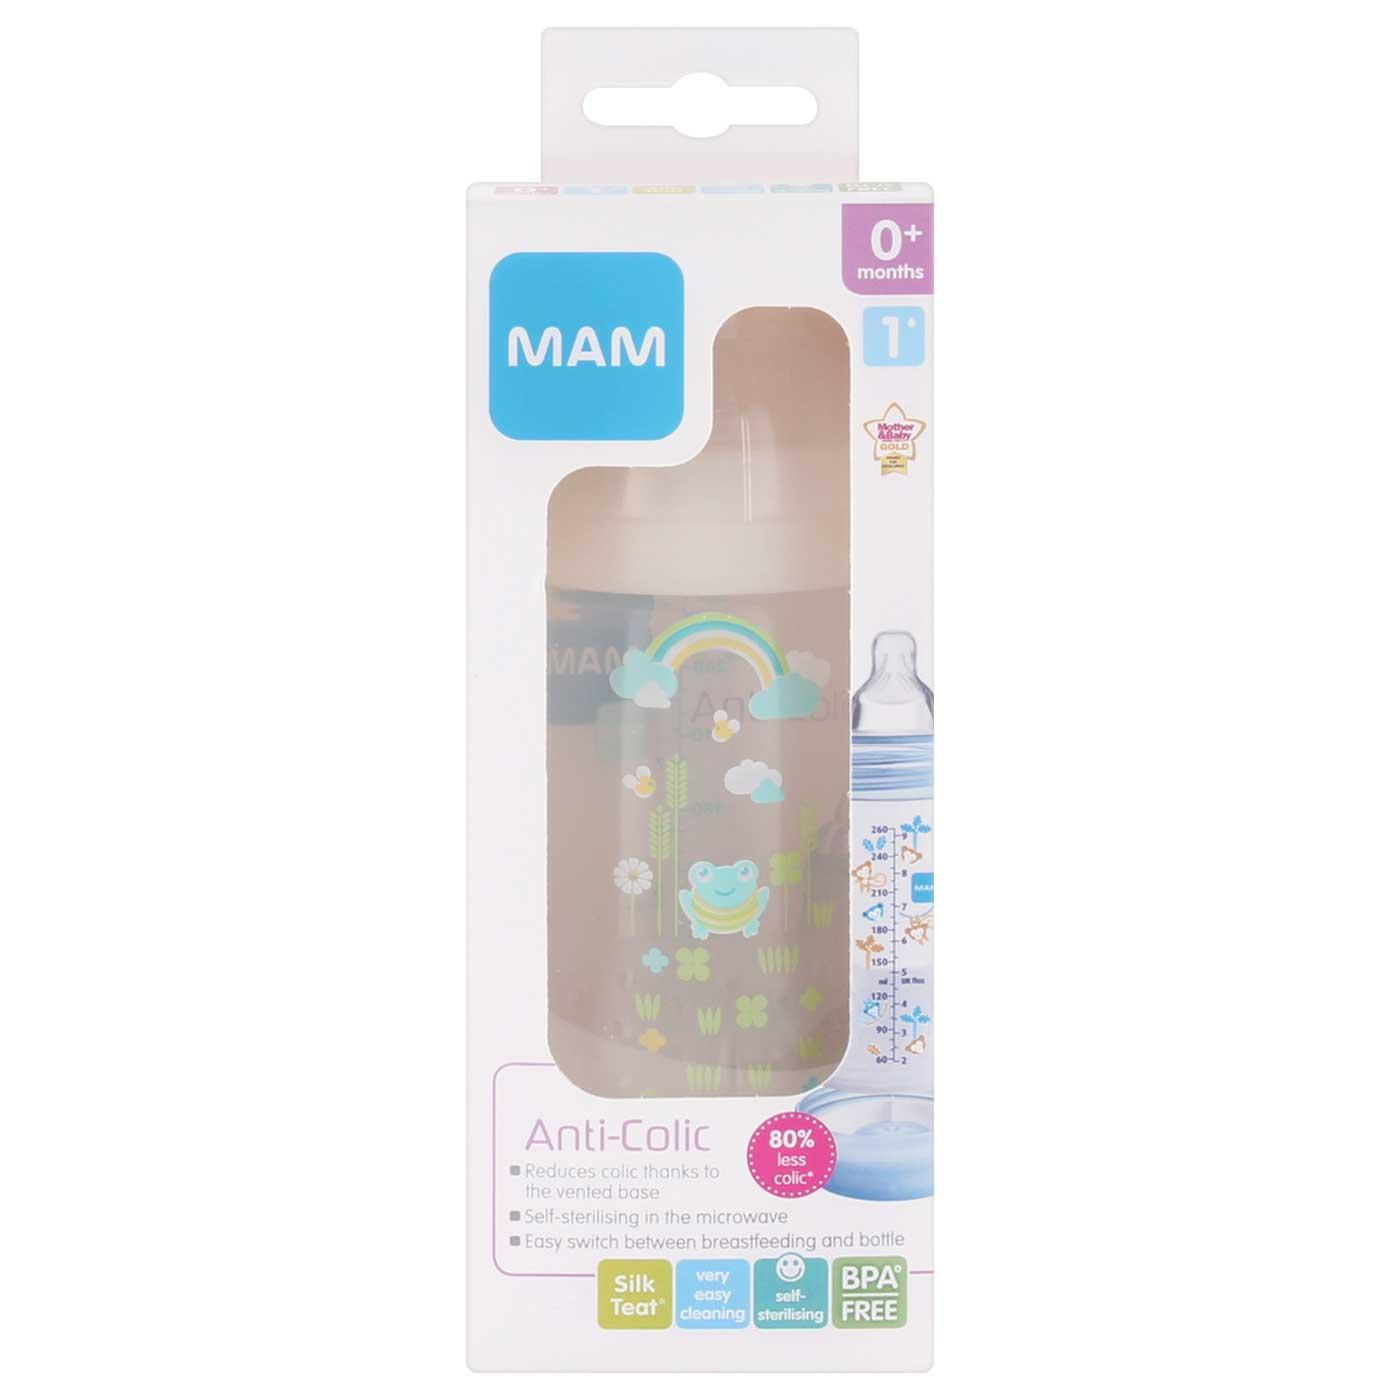 MAM Anti Colic Bottle Ivory 260ml